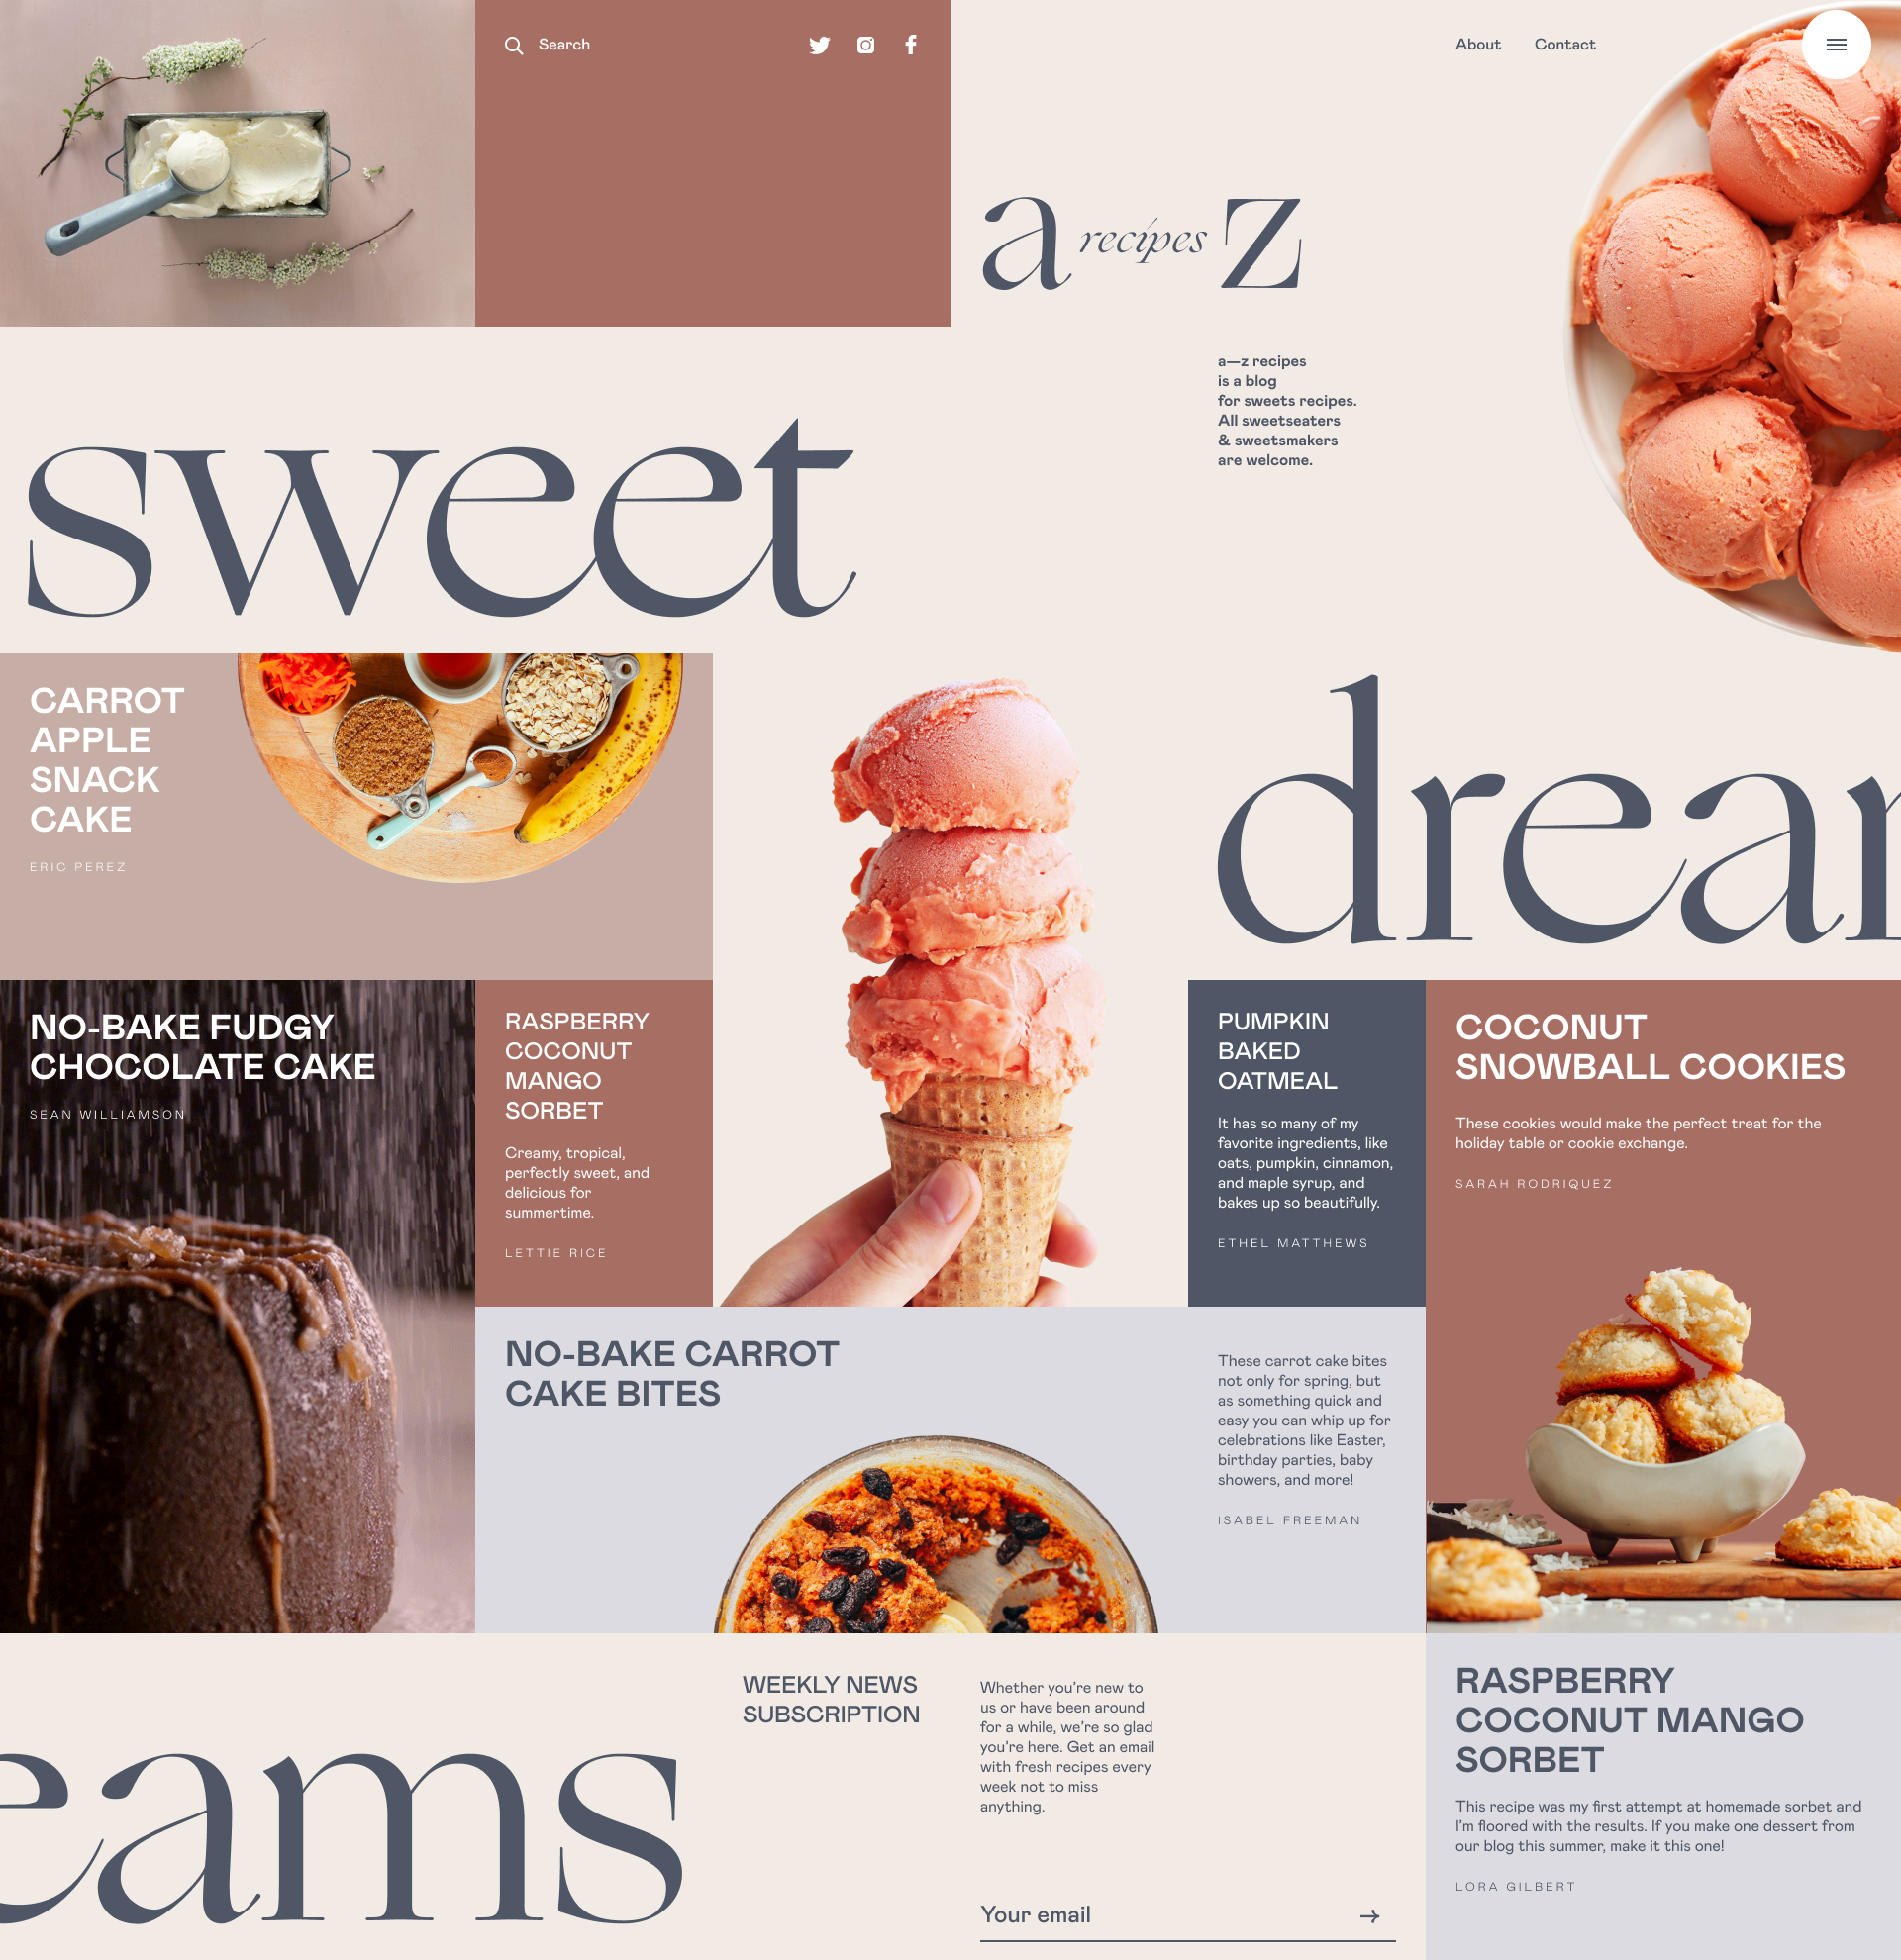 dessert recipe blog